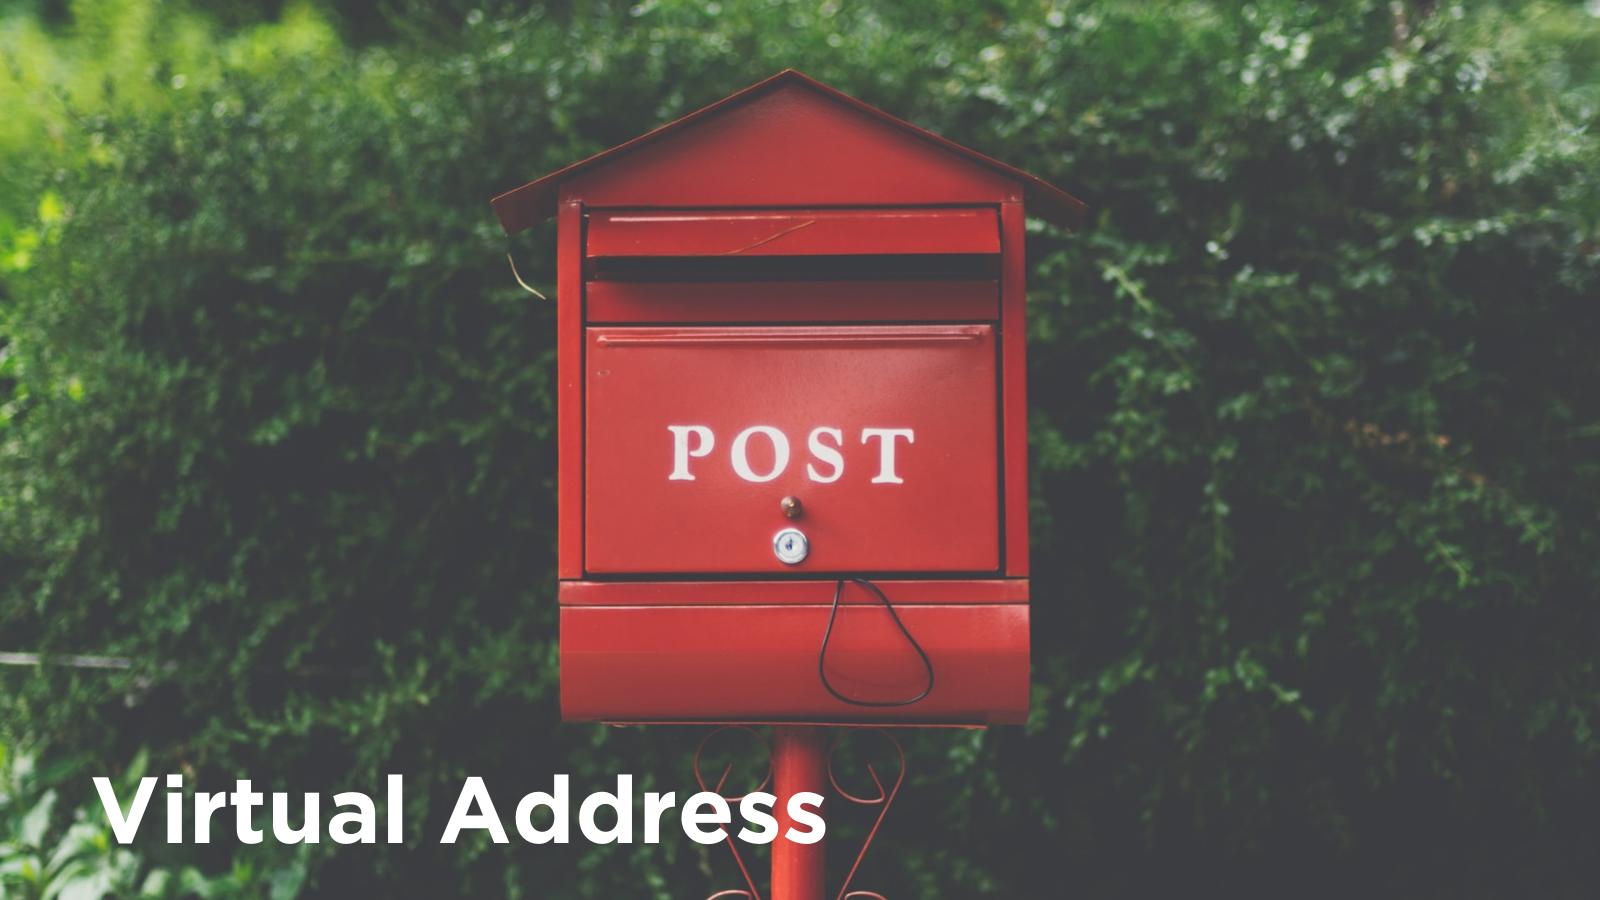 Virtual Mailbox business address